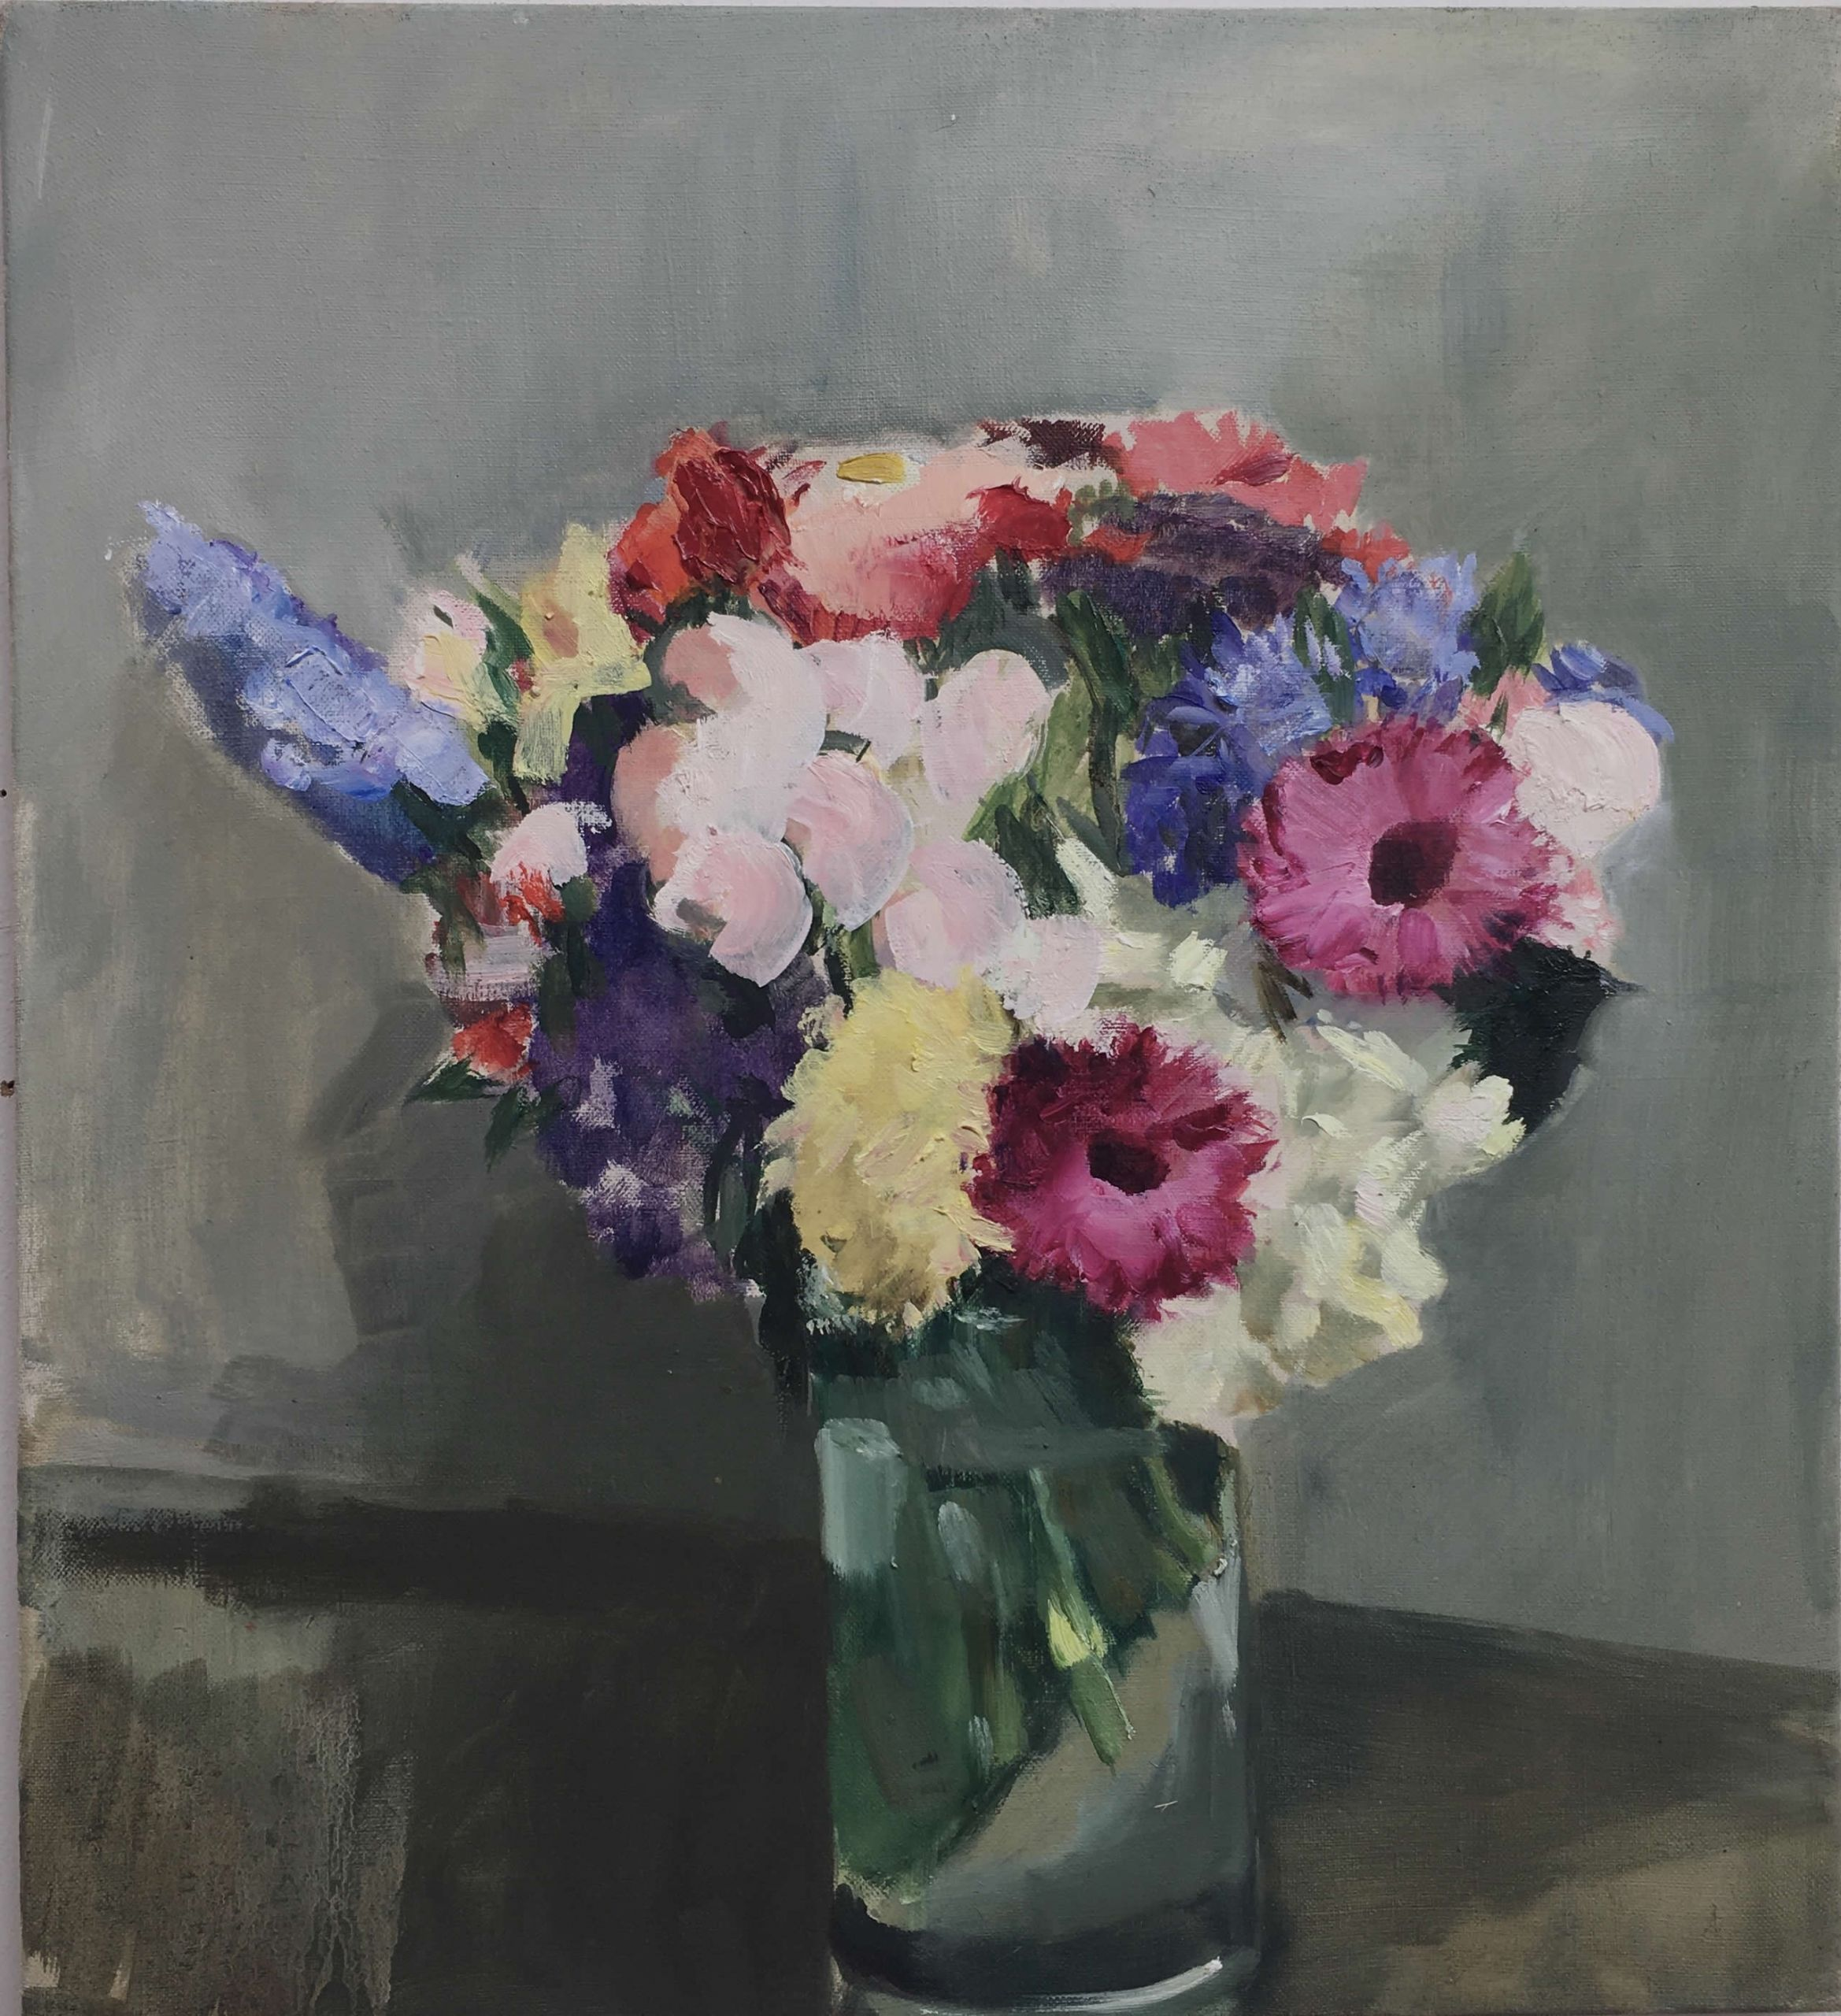 Alex Amann | 2020 | Öl auf Leinwand | 60x55cm | plaisirs simples | Galerie3